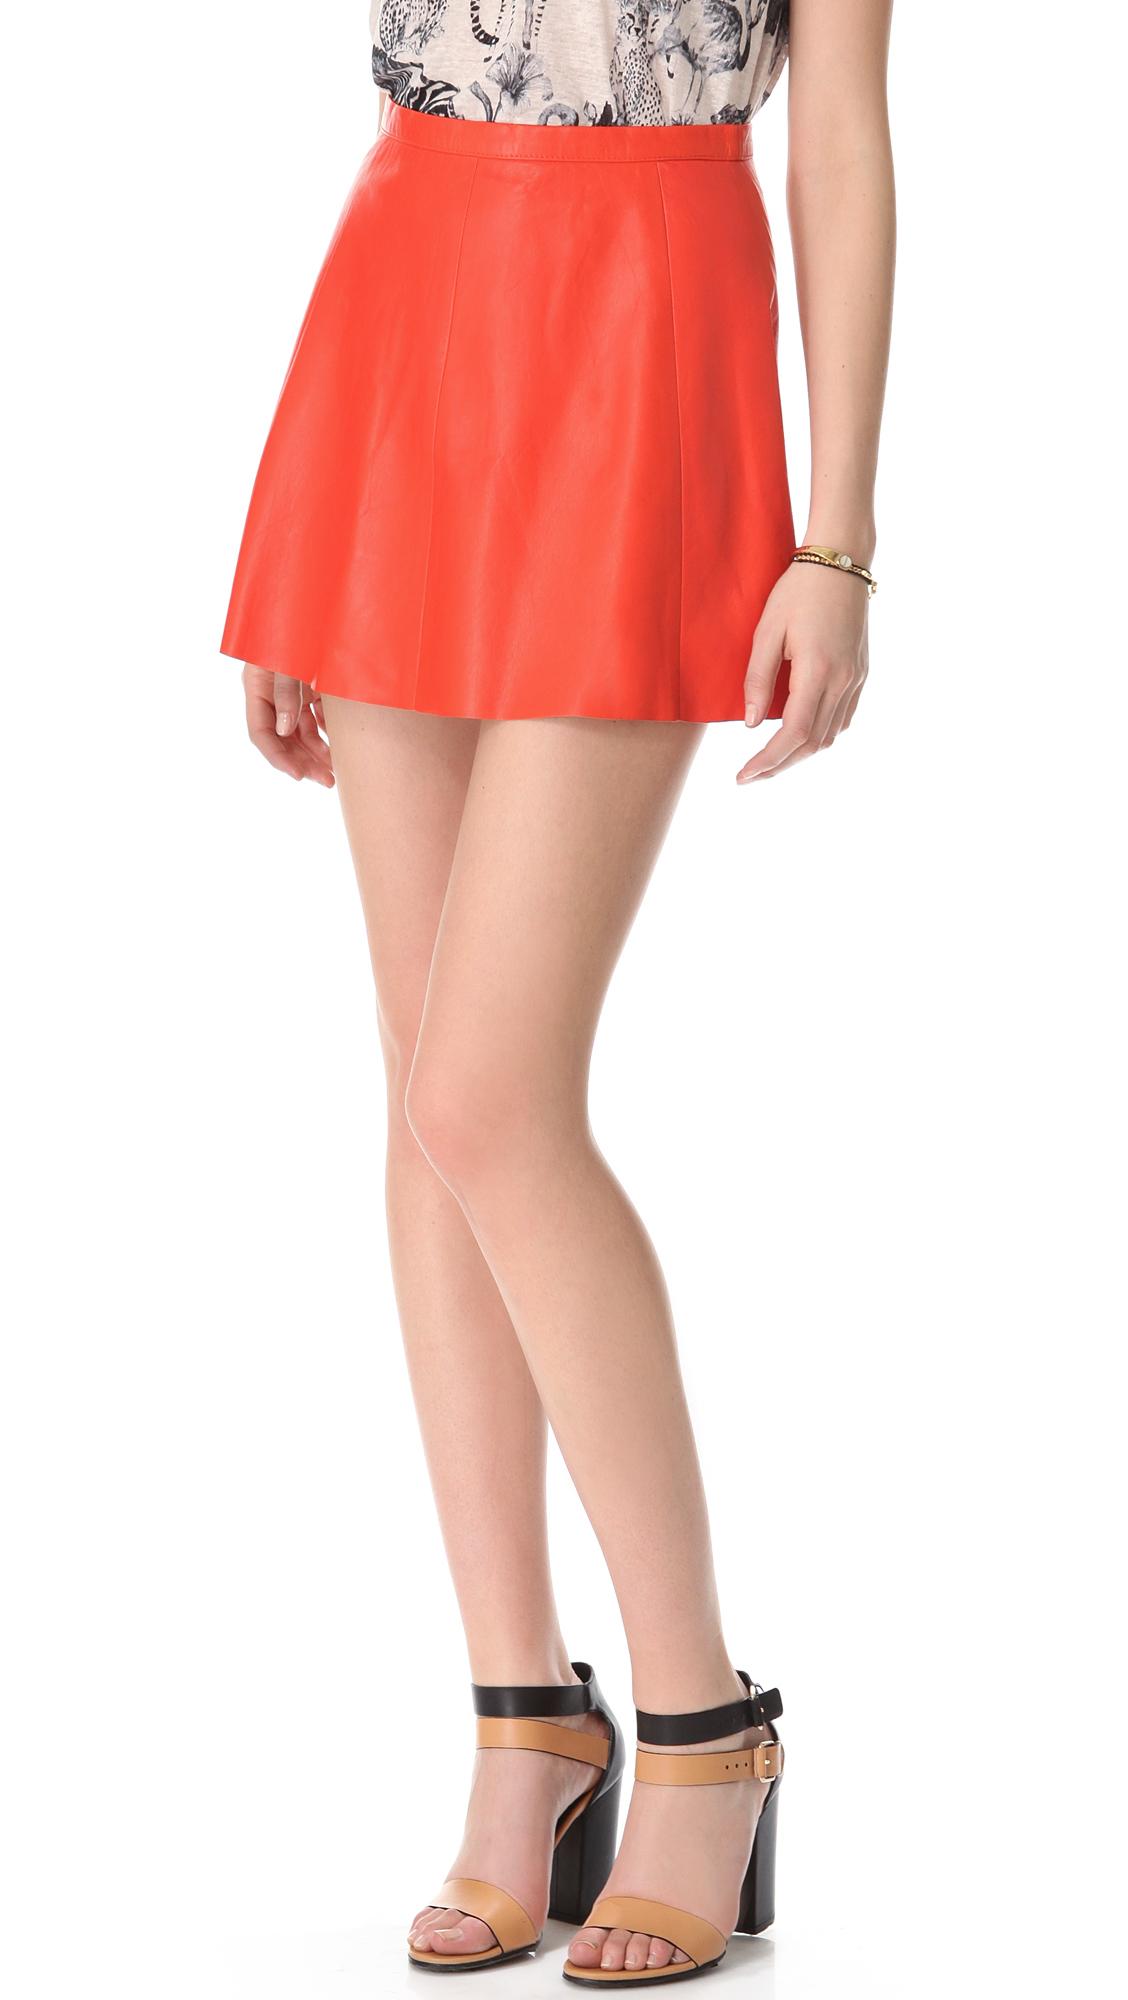 leather starburst a line mini skirt in starburst